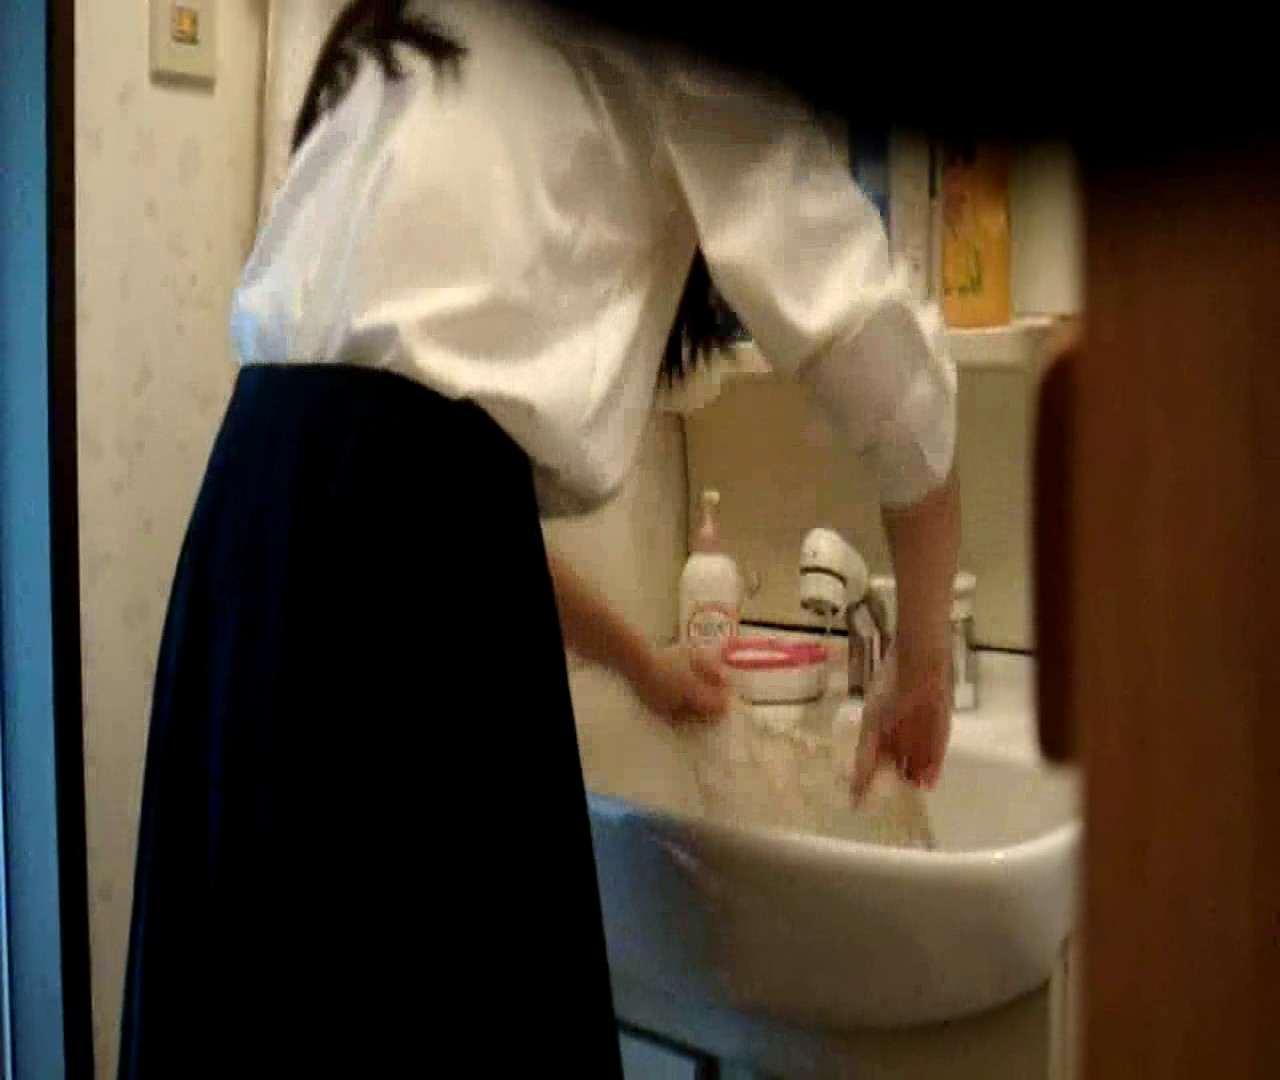 vol.5 まどかが帰宅後の洗顔後にブラを洗ってます。 ギャル達  112枚 84